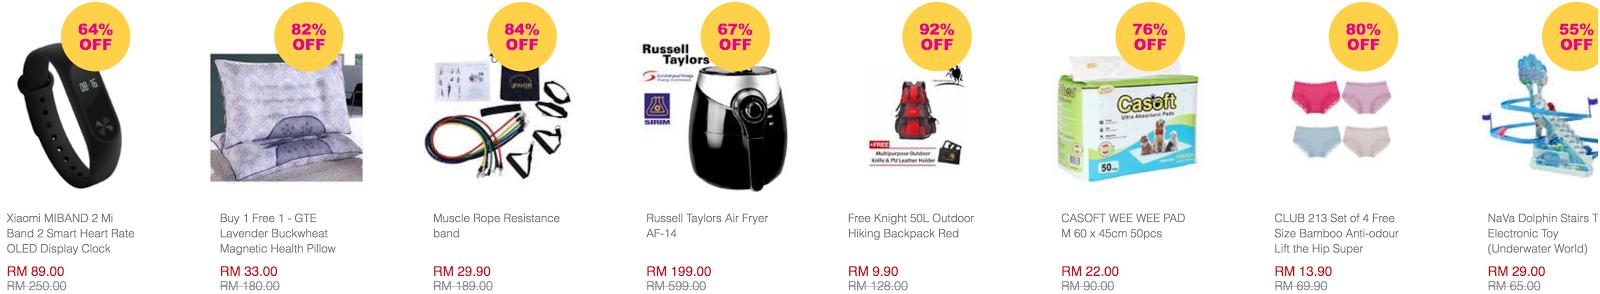 f899202d0e3c Lazada Malaysia 5th Birthday Surprise Flash Sale Price List 24 March ...